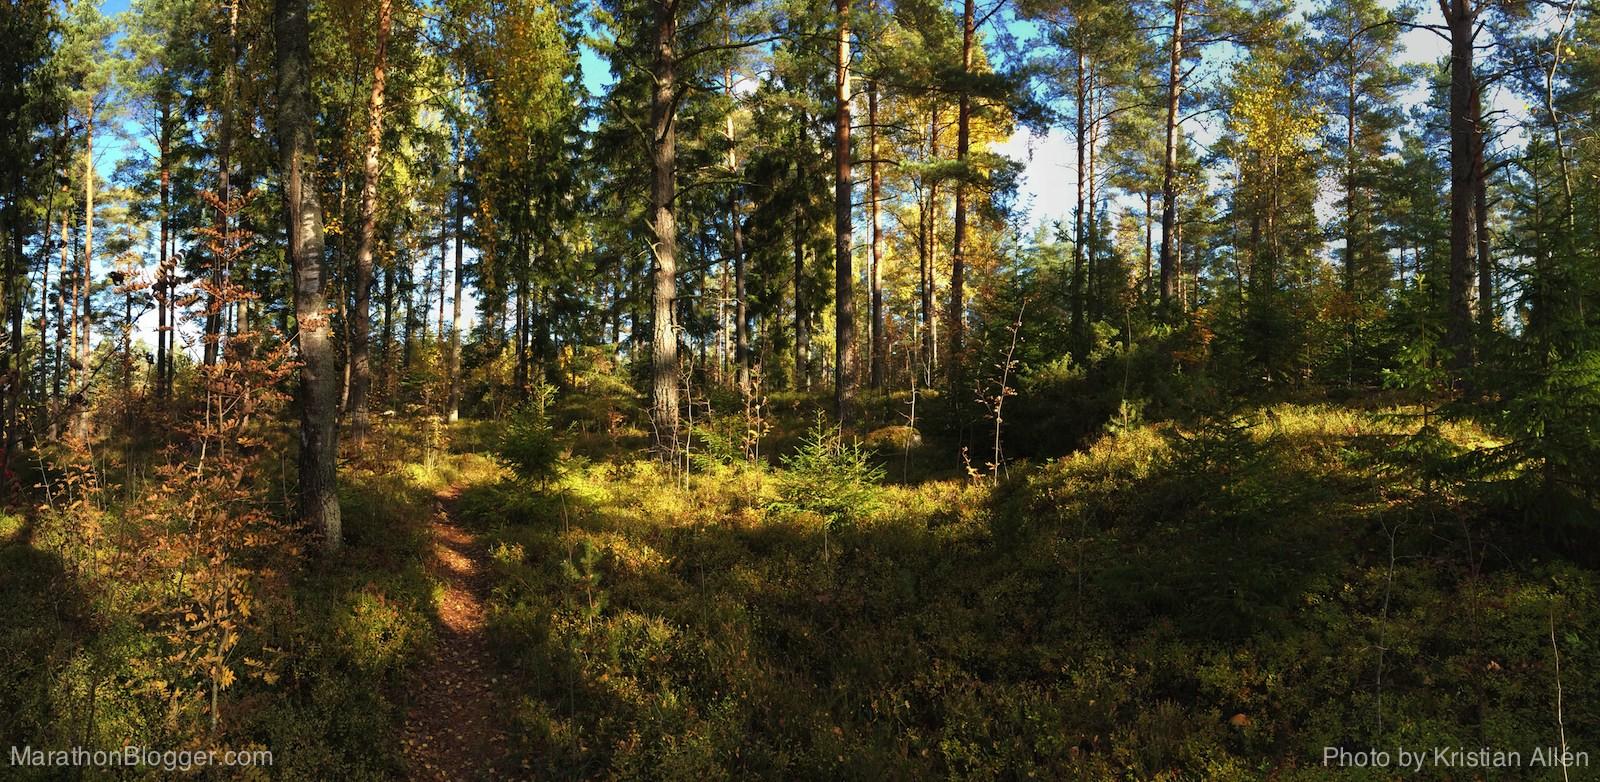 5.10.2014 10.42 km